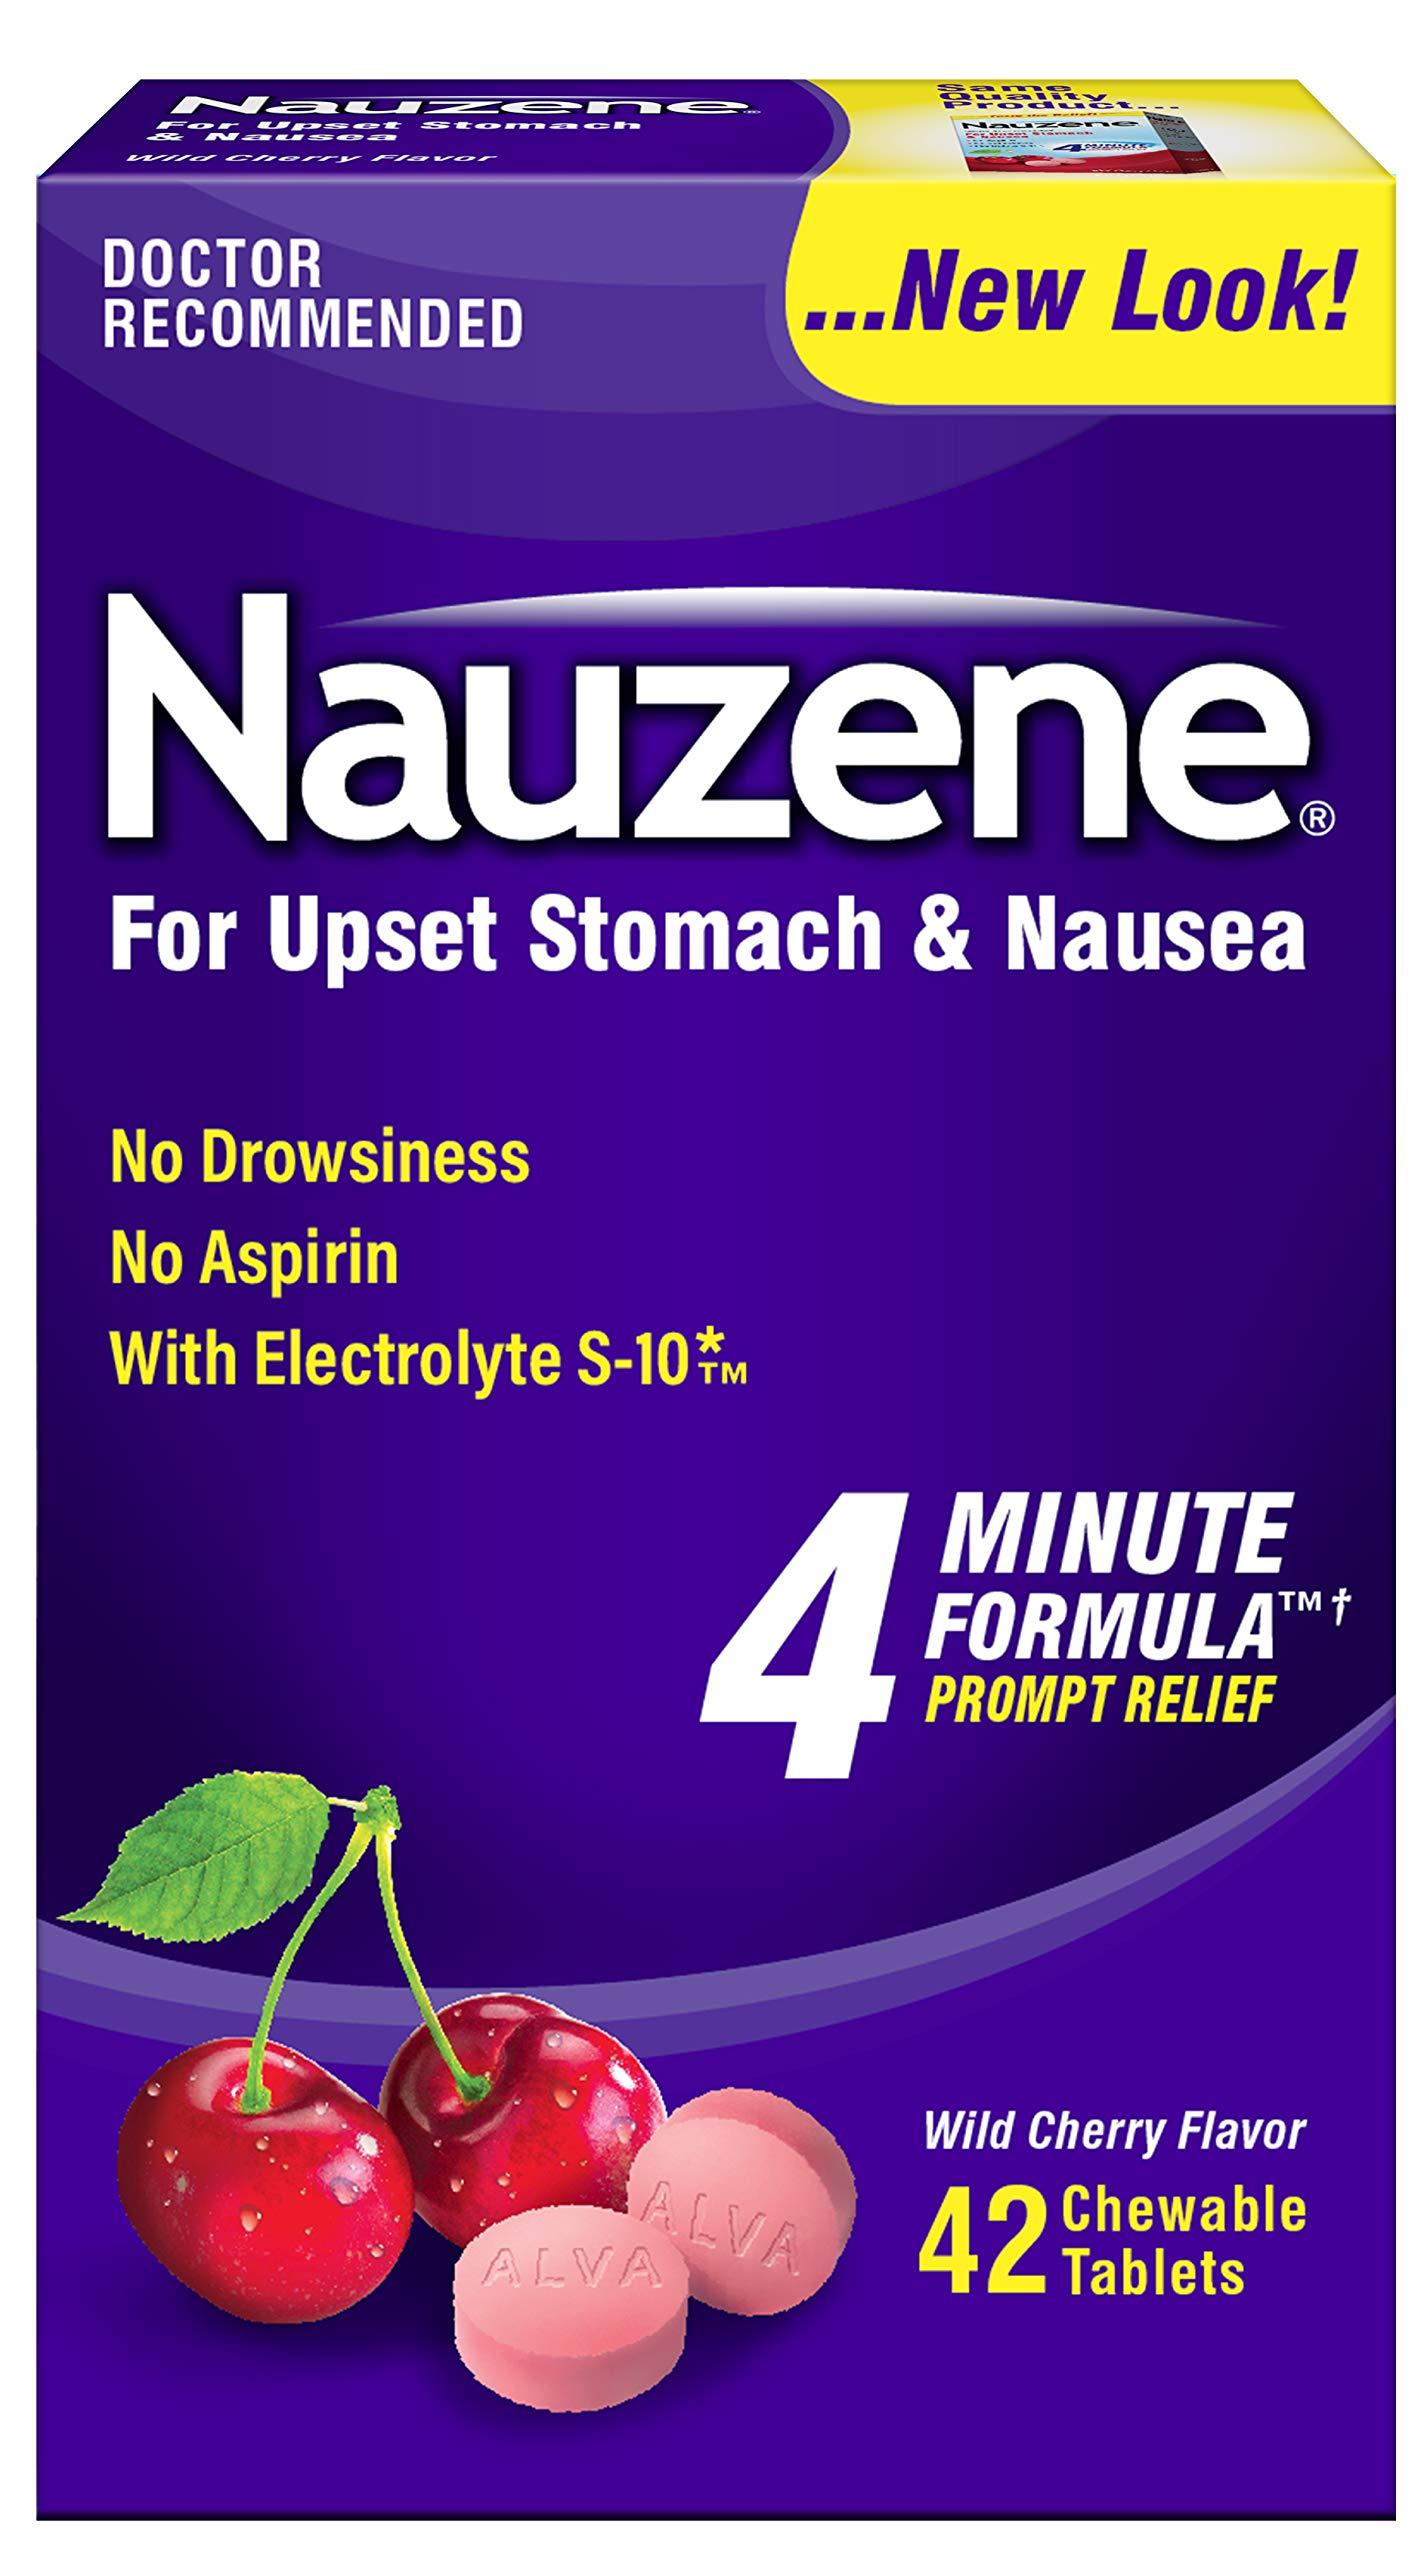 Nauzene Upset Stomach & Nausea Chewable Tablets Wild Cherry Flavor - 42 ct, Pack of 6 by Nauzene